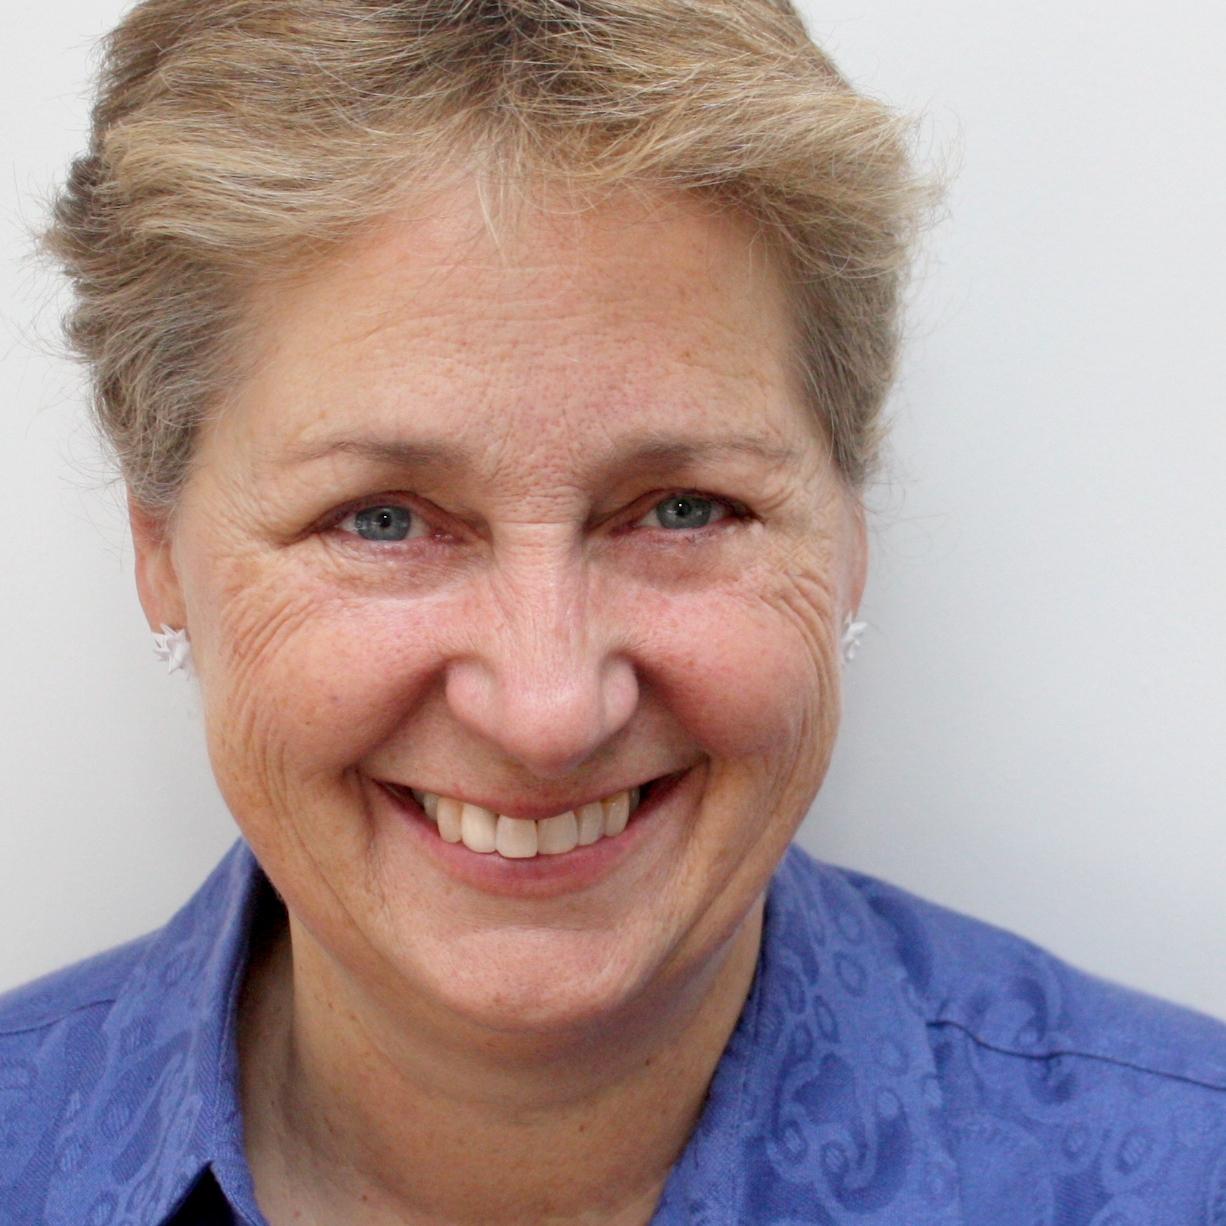 Vivian Loftness - Committee Co-chairProfessor at Paul Mellon University, Former head of Architecture at Carnegie Mellon University